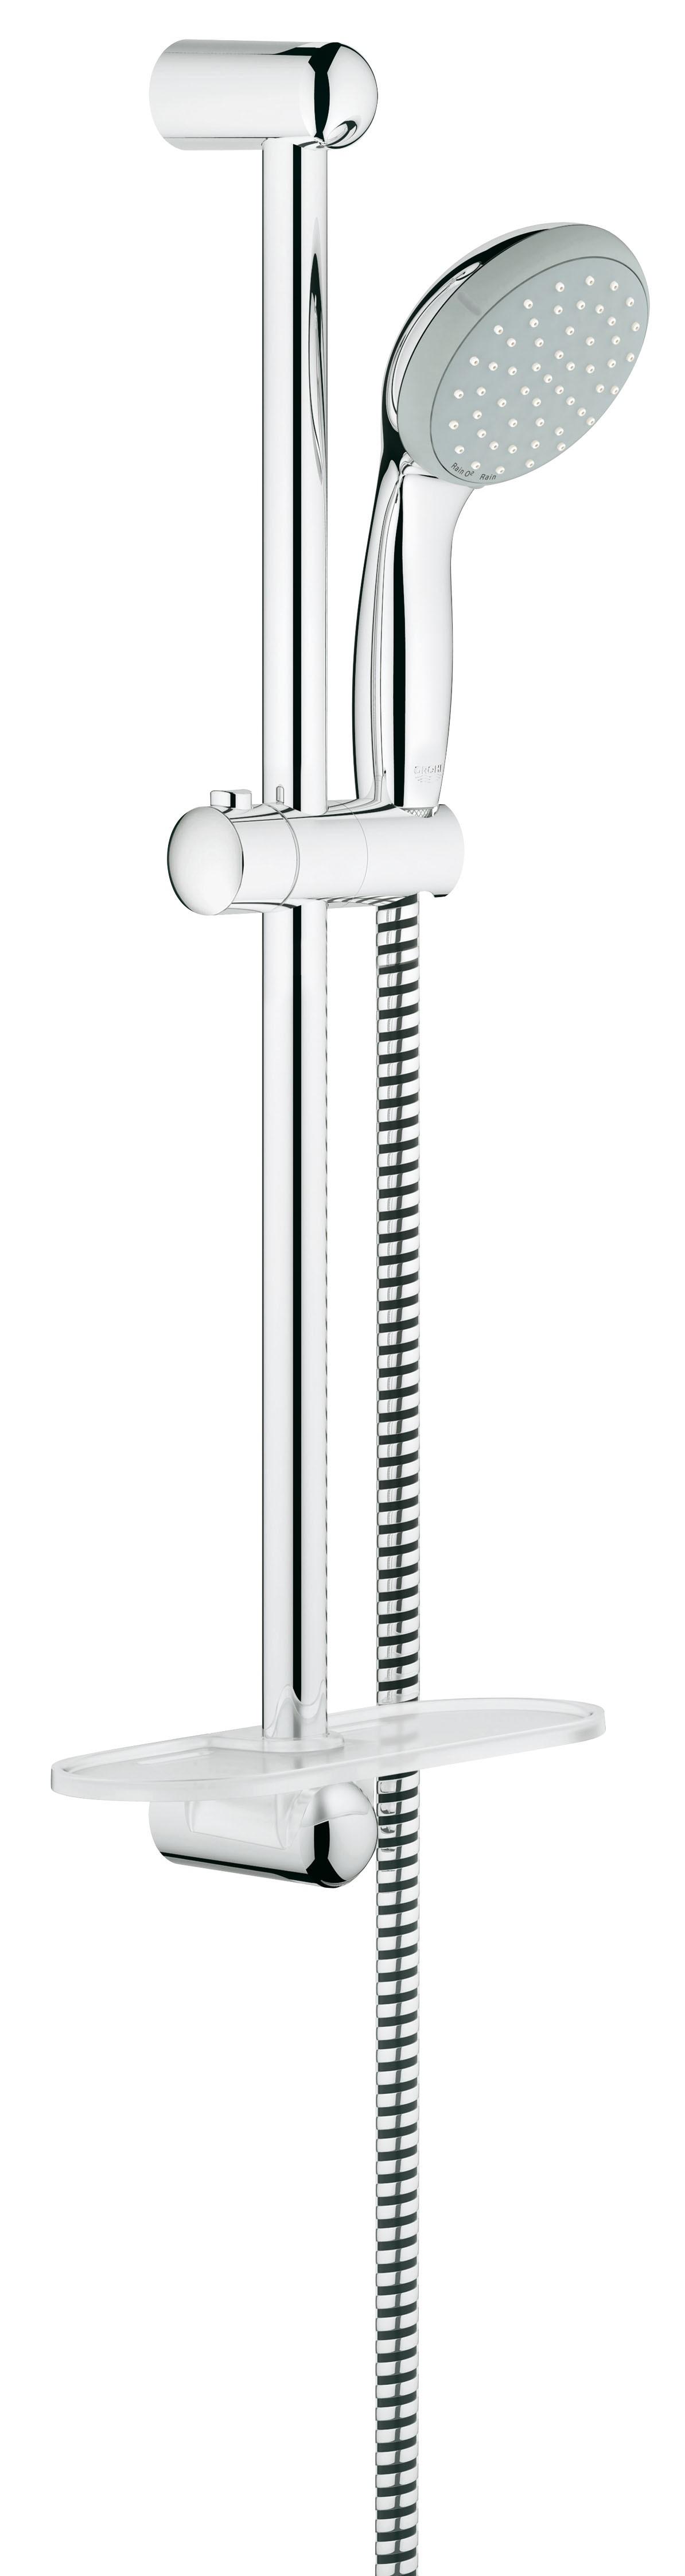 Grohe 27926000 Tempesta Classic (ручной душ, штанга 600 мм, шланг 1750 мм), хром